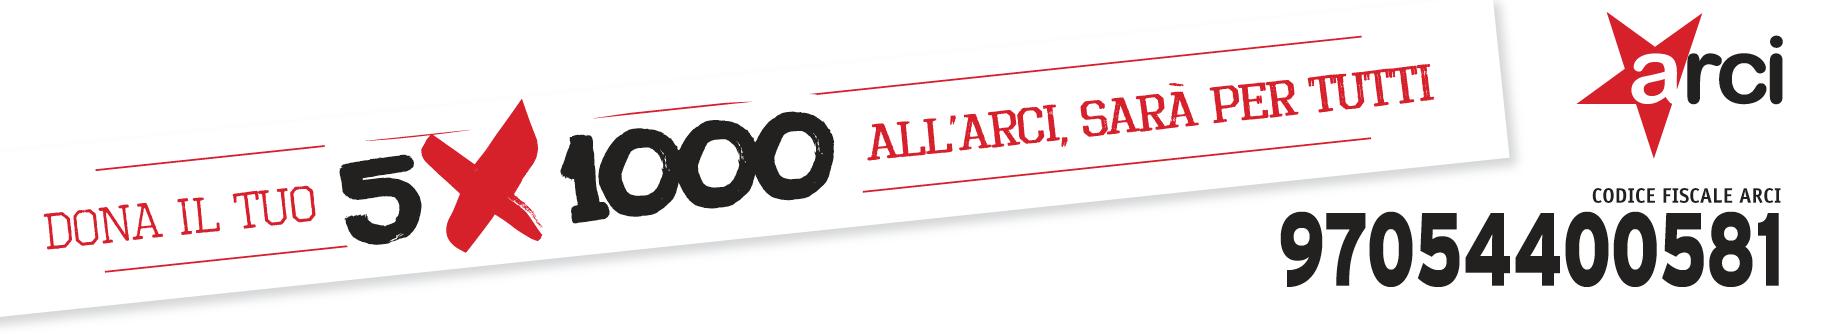 fondo-home-binaco-5x1000-arci-2018